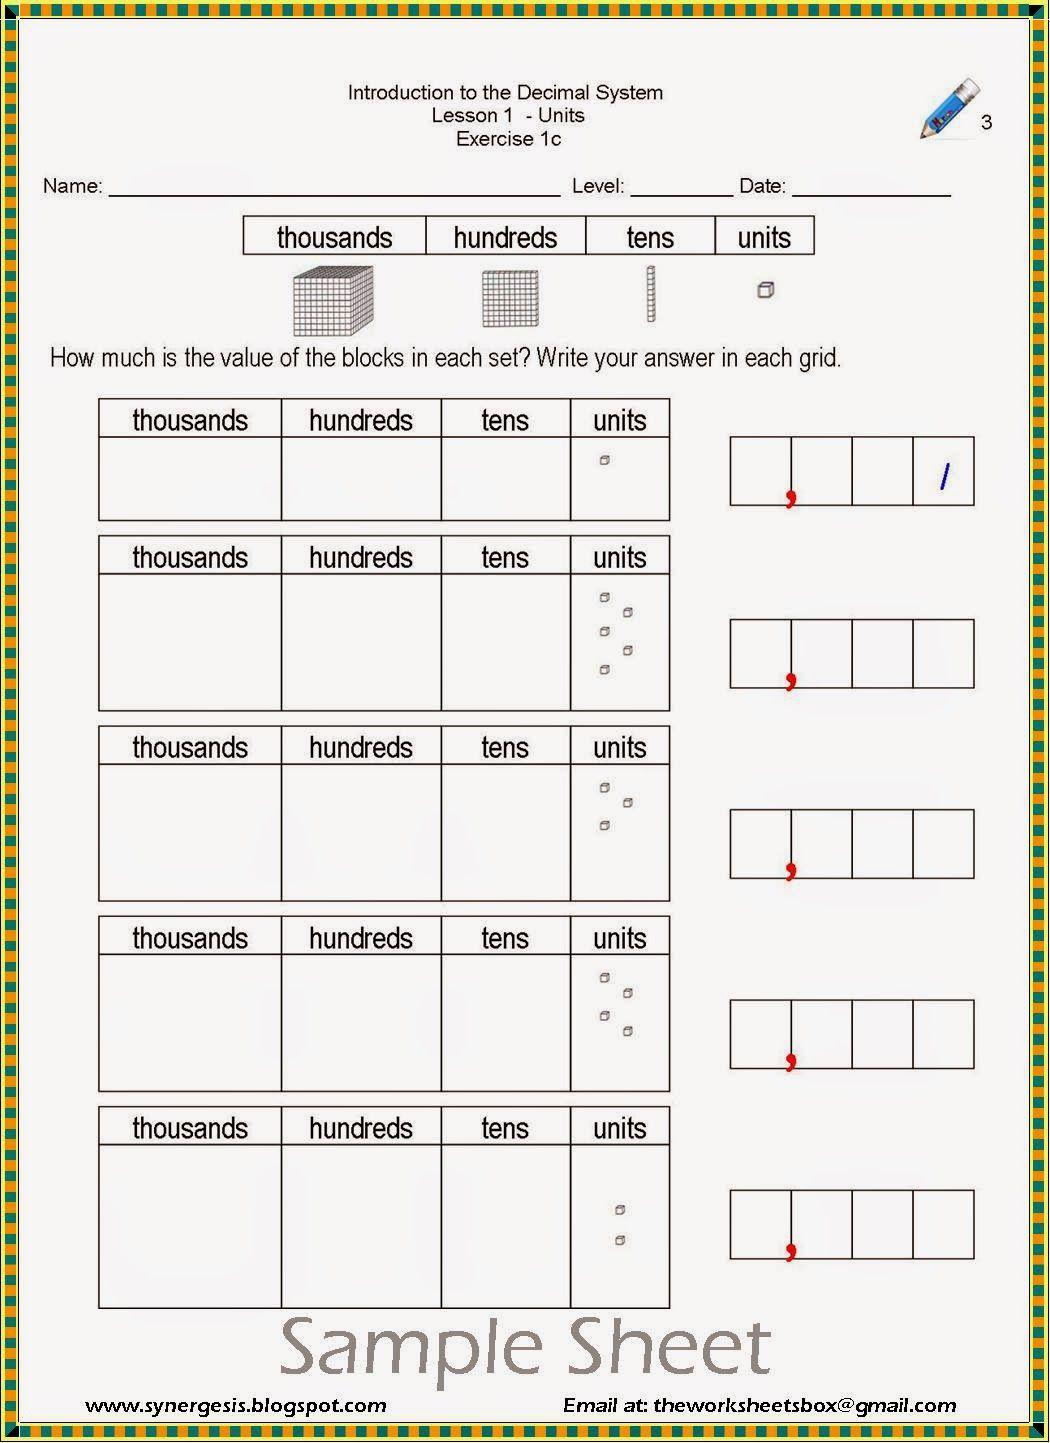 The Worksheets Box Decimal System Number System Worksheets Kids Worksheets Printables Printable Worksheets Decimal addition lesson answer key